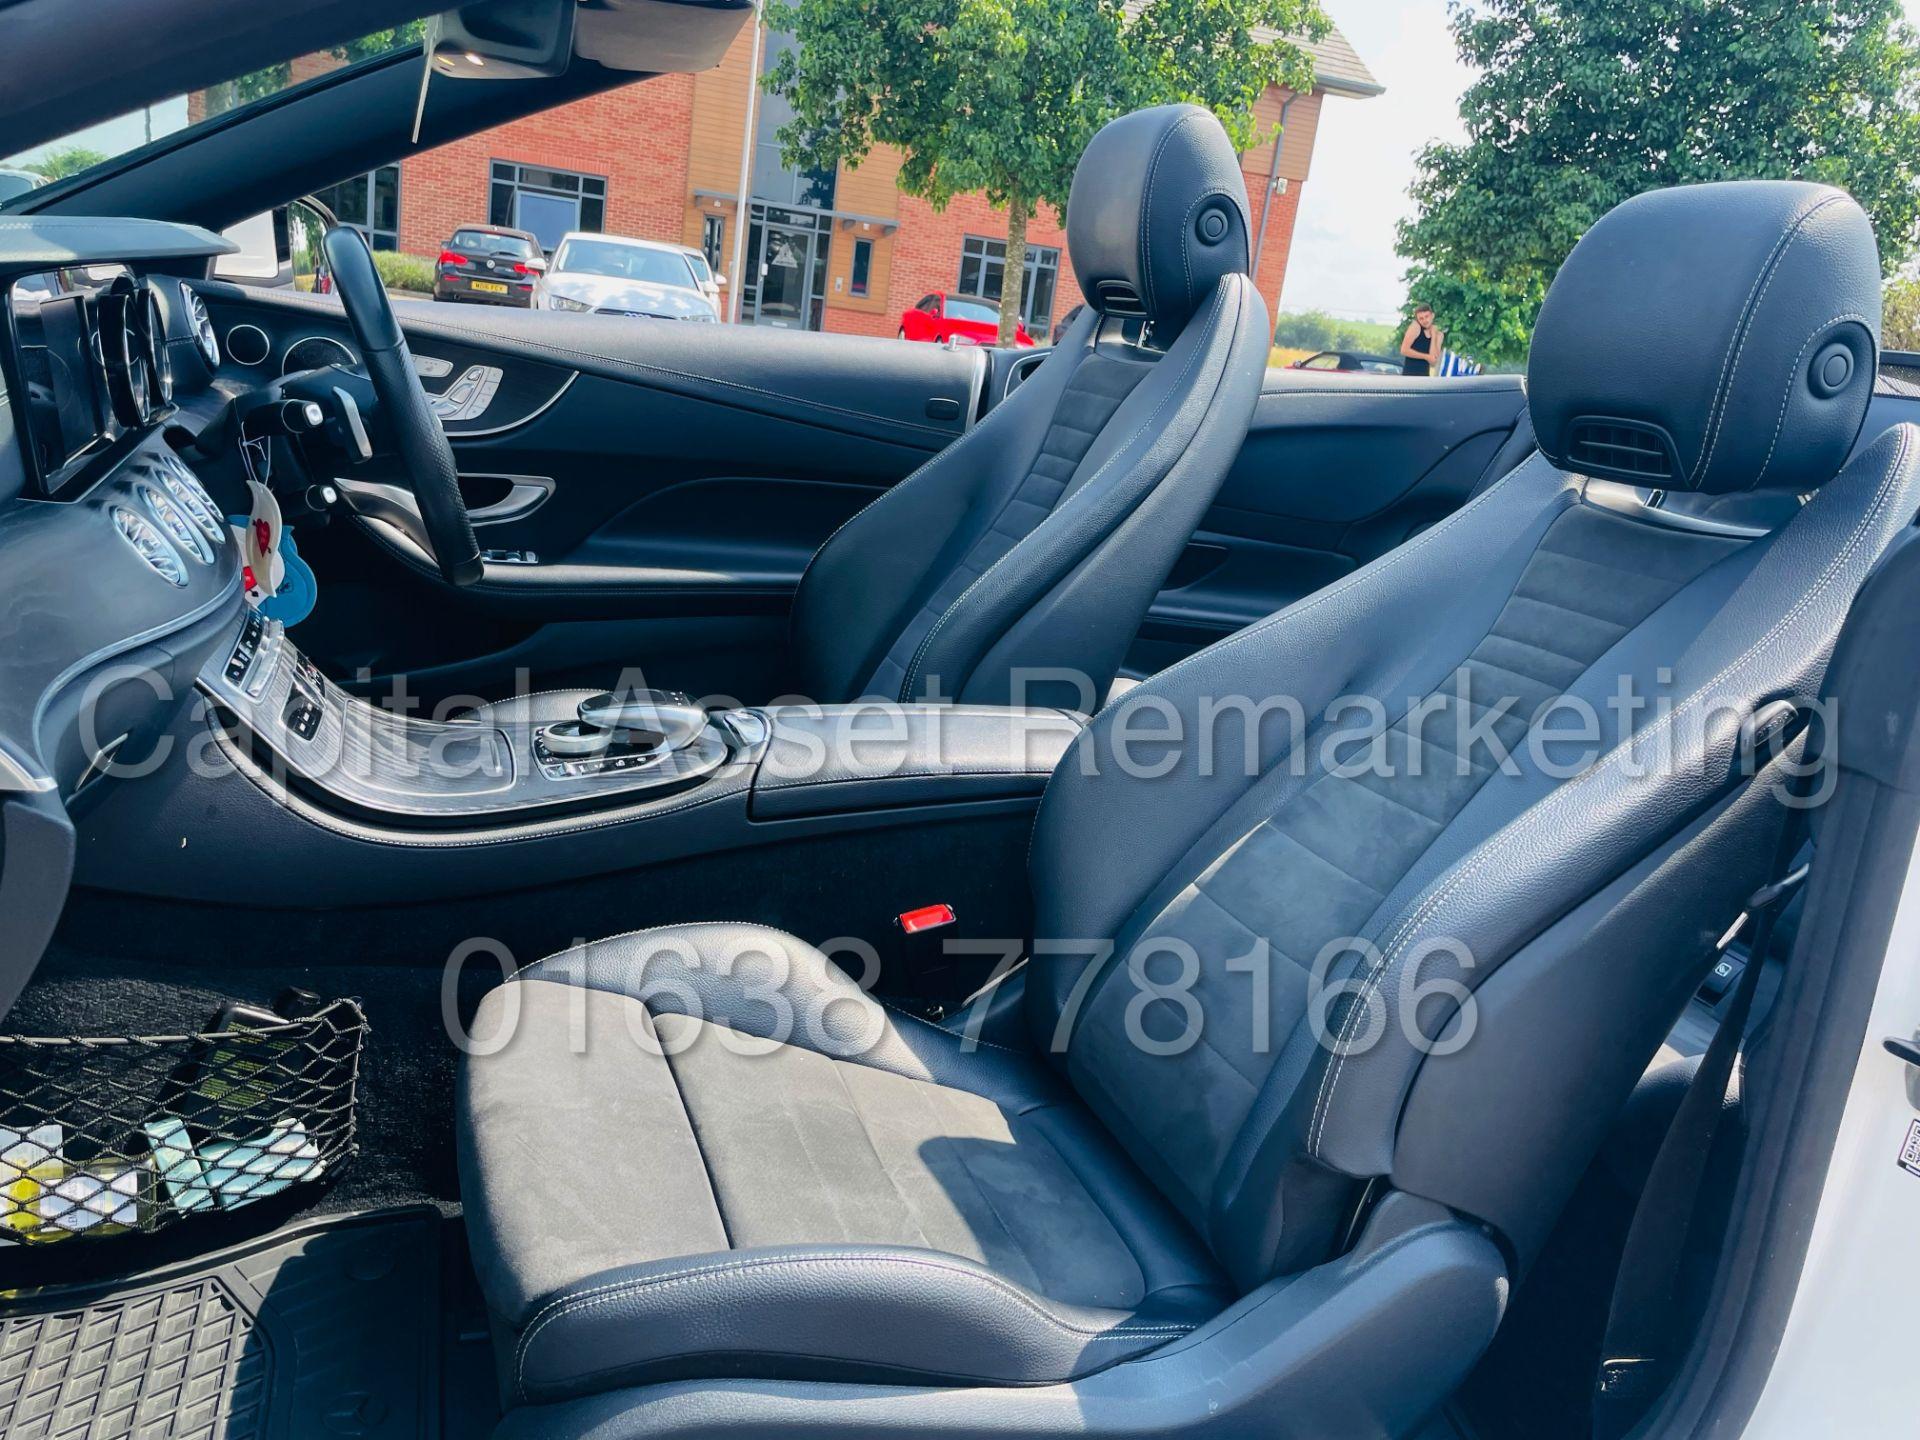 MERCEDES-BENZ E220d *AMG LINE PREMIUM - CABRIOLET* (2018 - EURO 6) '9G AUTO - LEATHER - SAT NAV' - Image 40 of 63